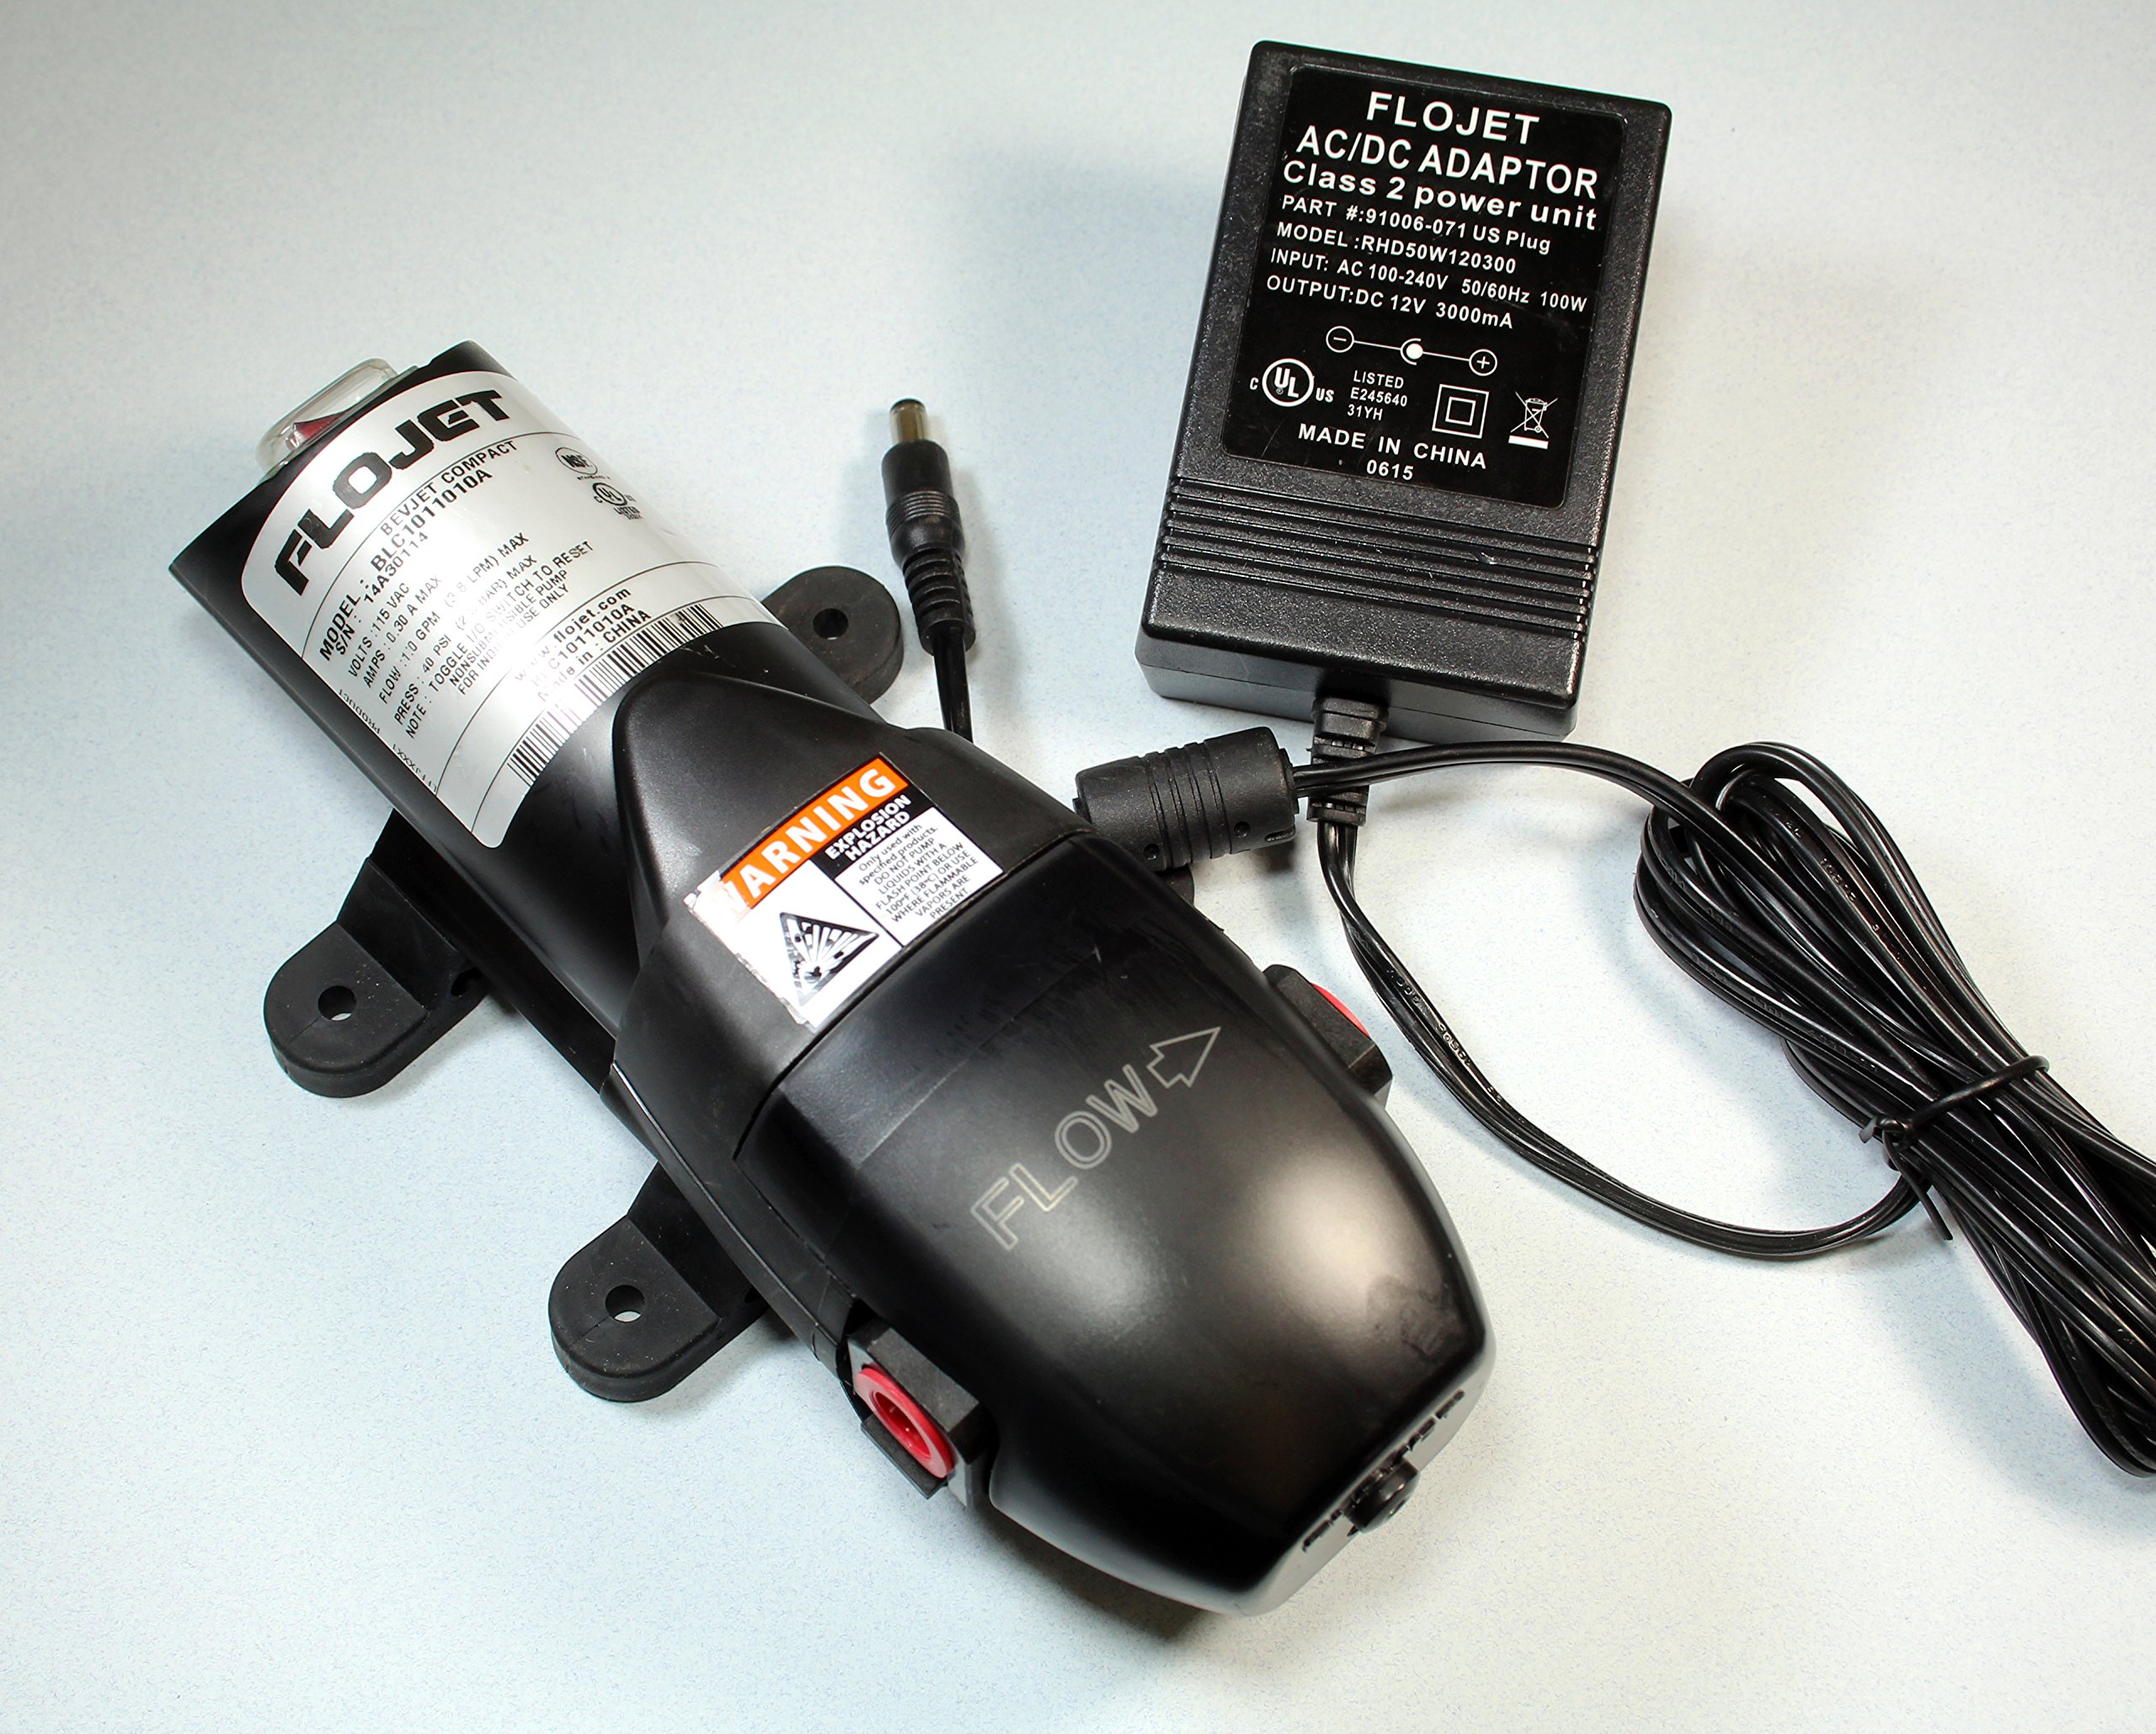 Flojet Bevjet Compact Beverage Pump with Adapter 40psi 12v 1.0 GPM by Flojet (Image #1)